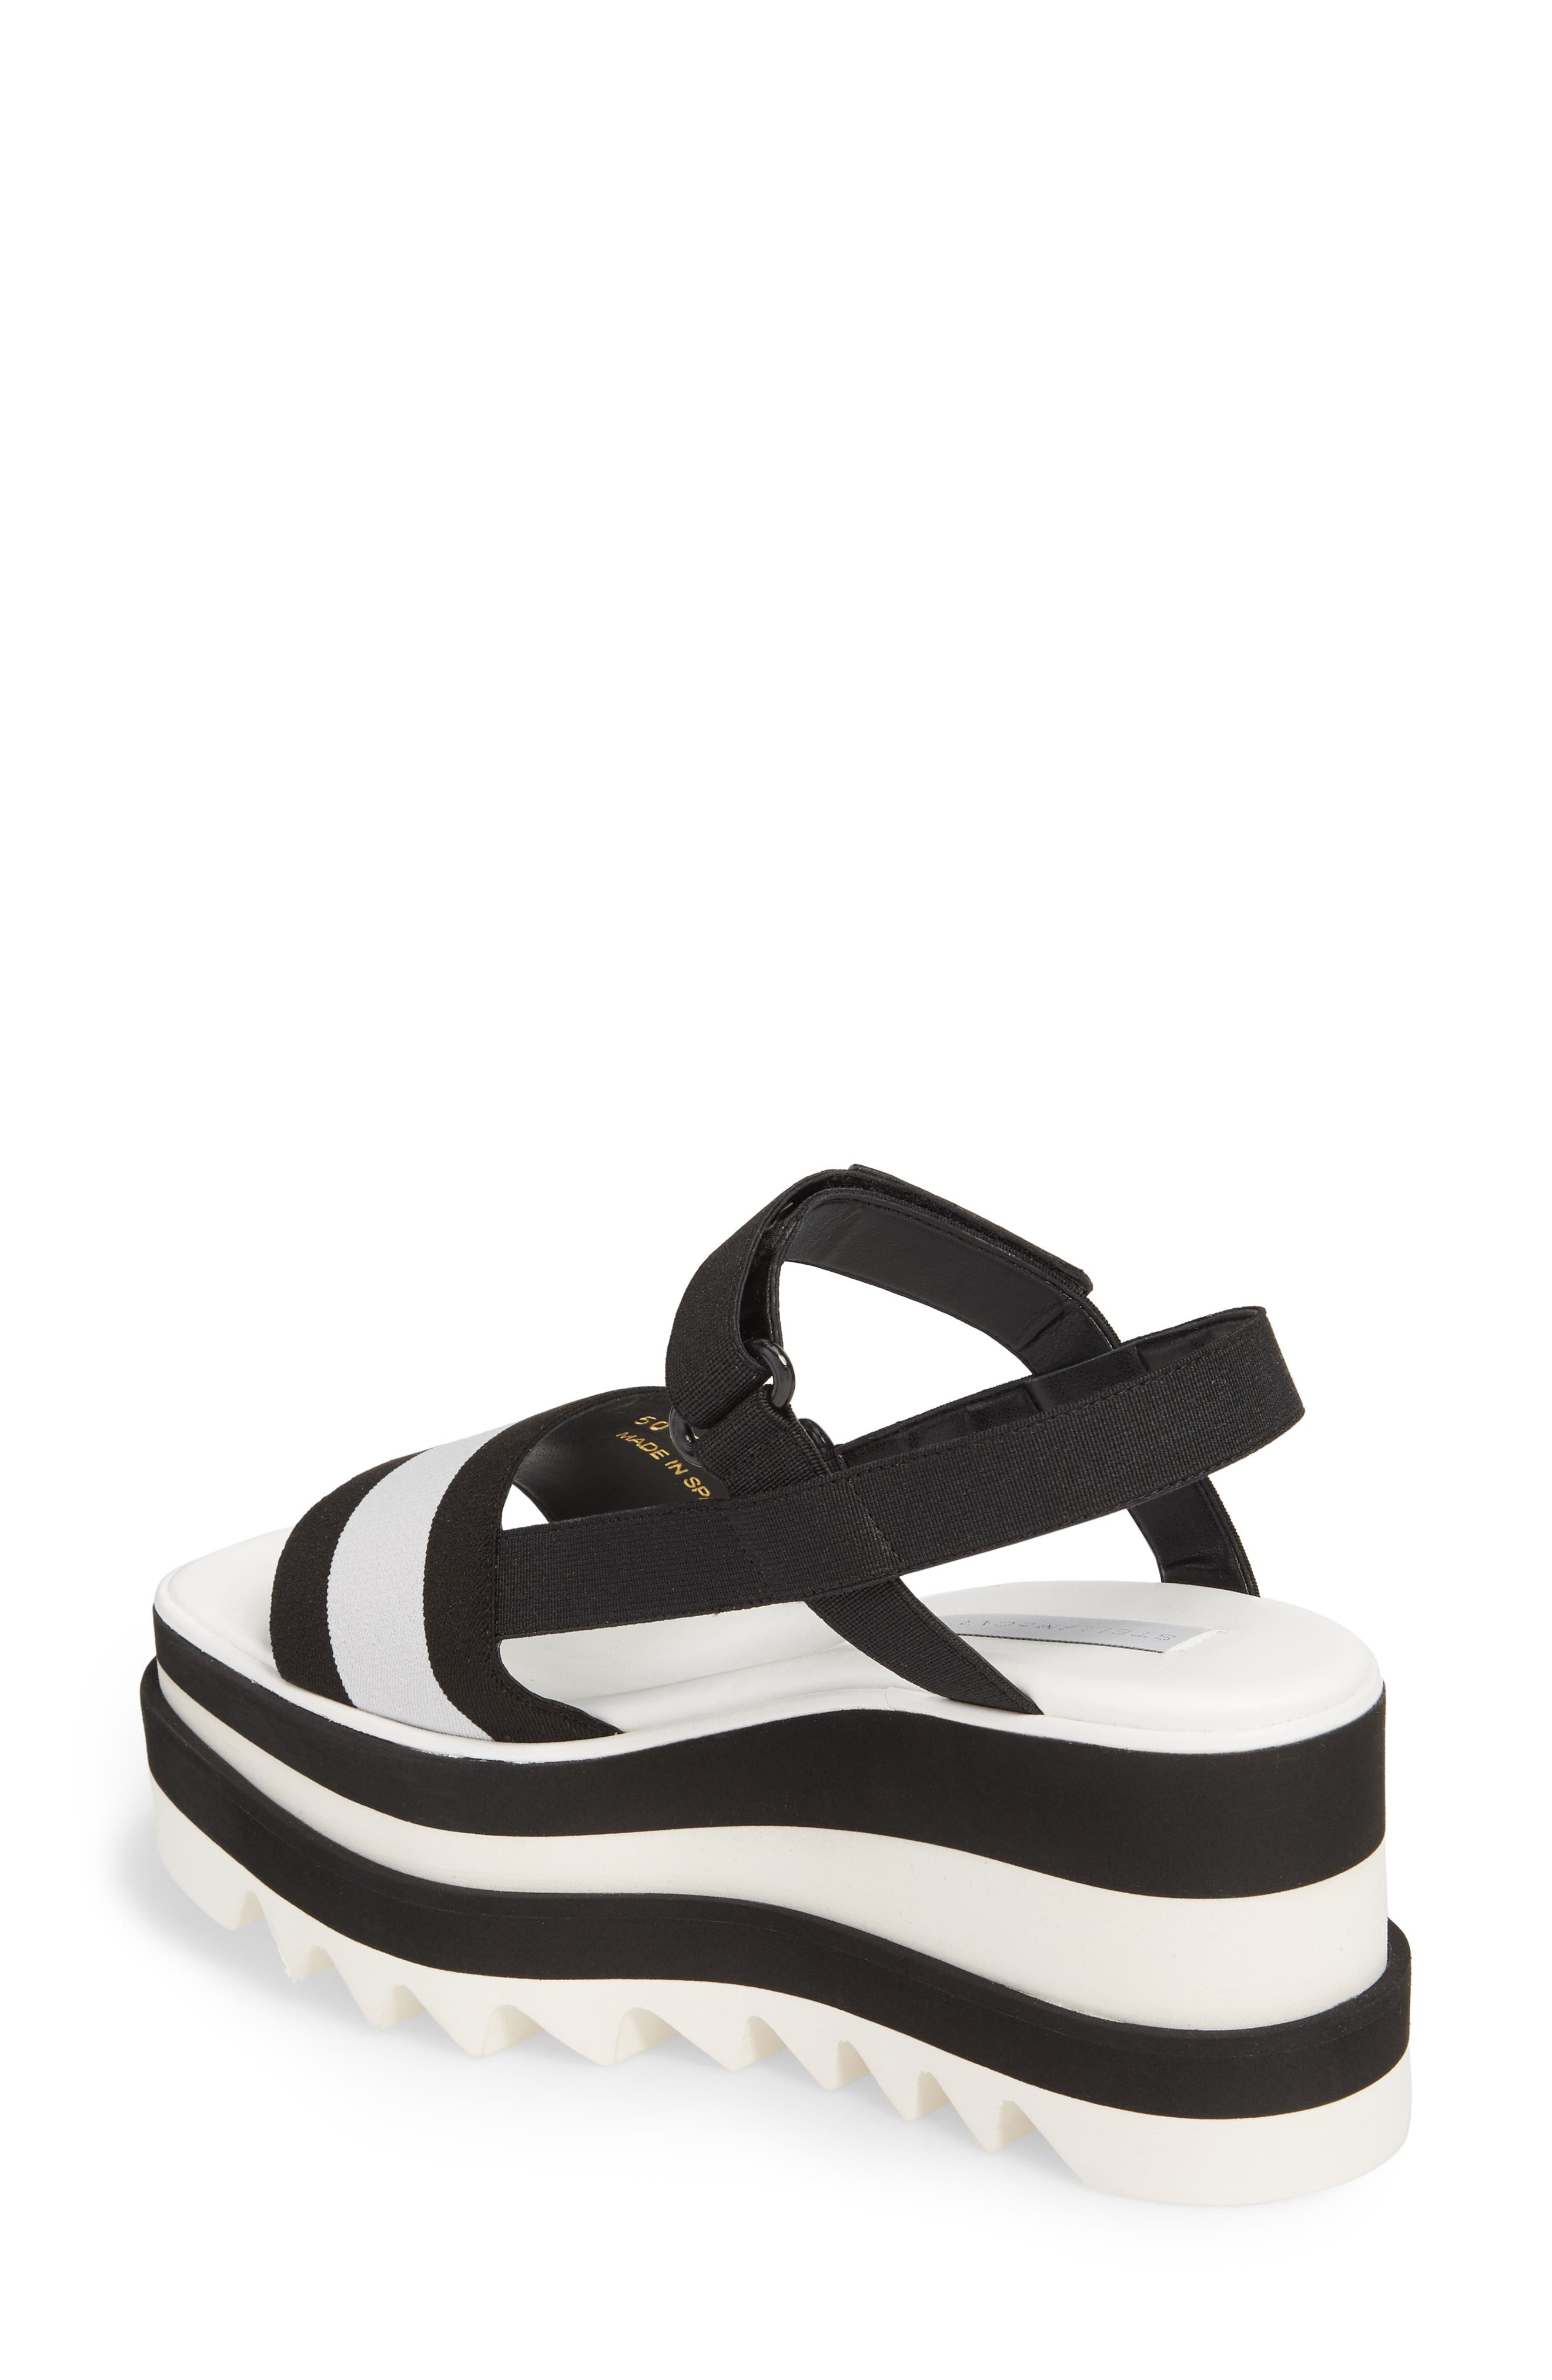 Stripe Platform Sandal,                             Alternate thumbnail 2, color,                             Black/ White